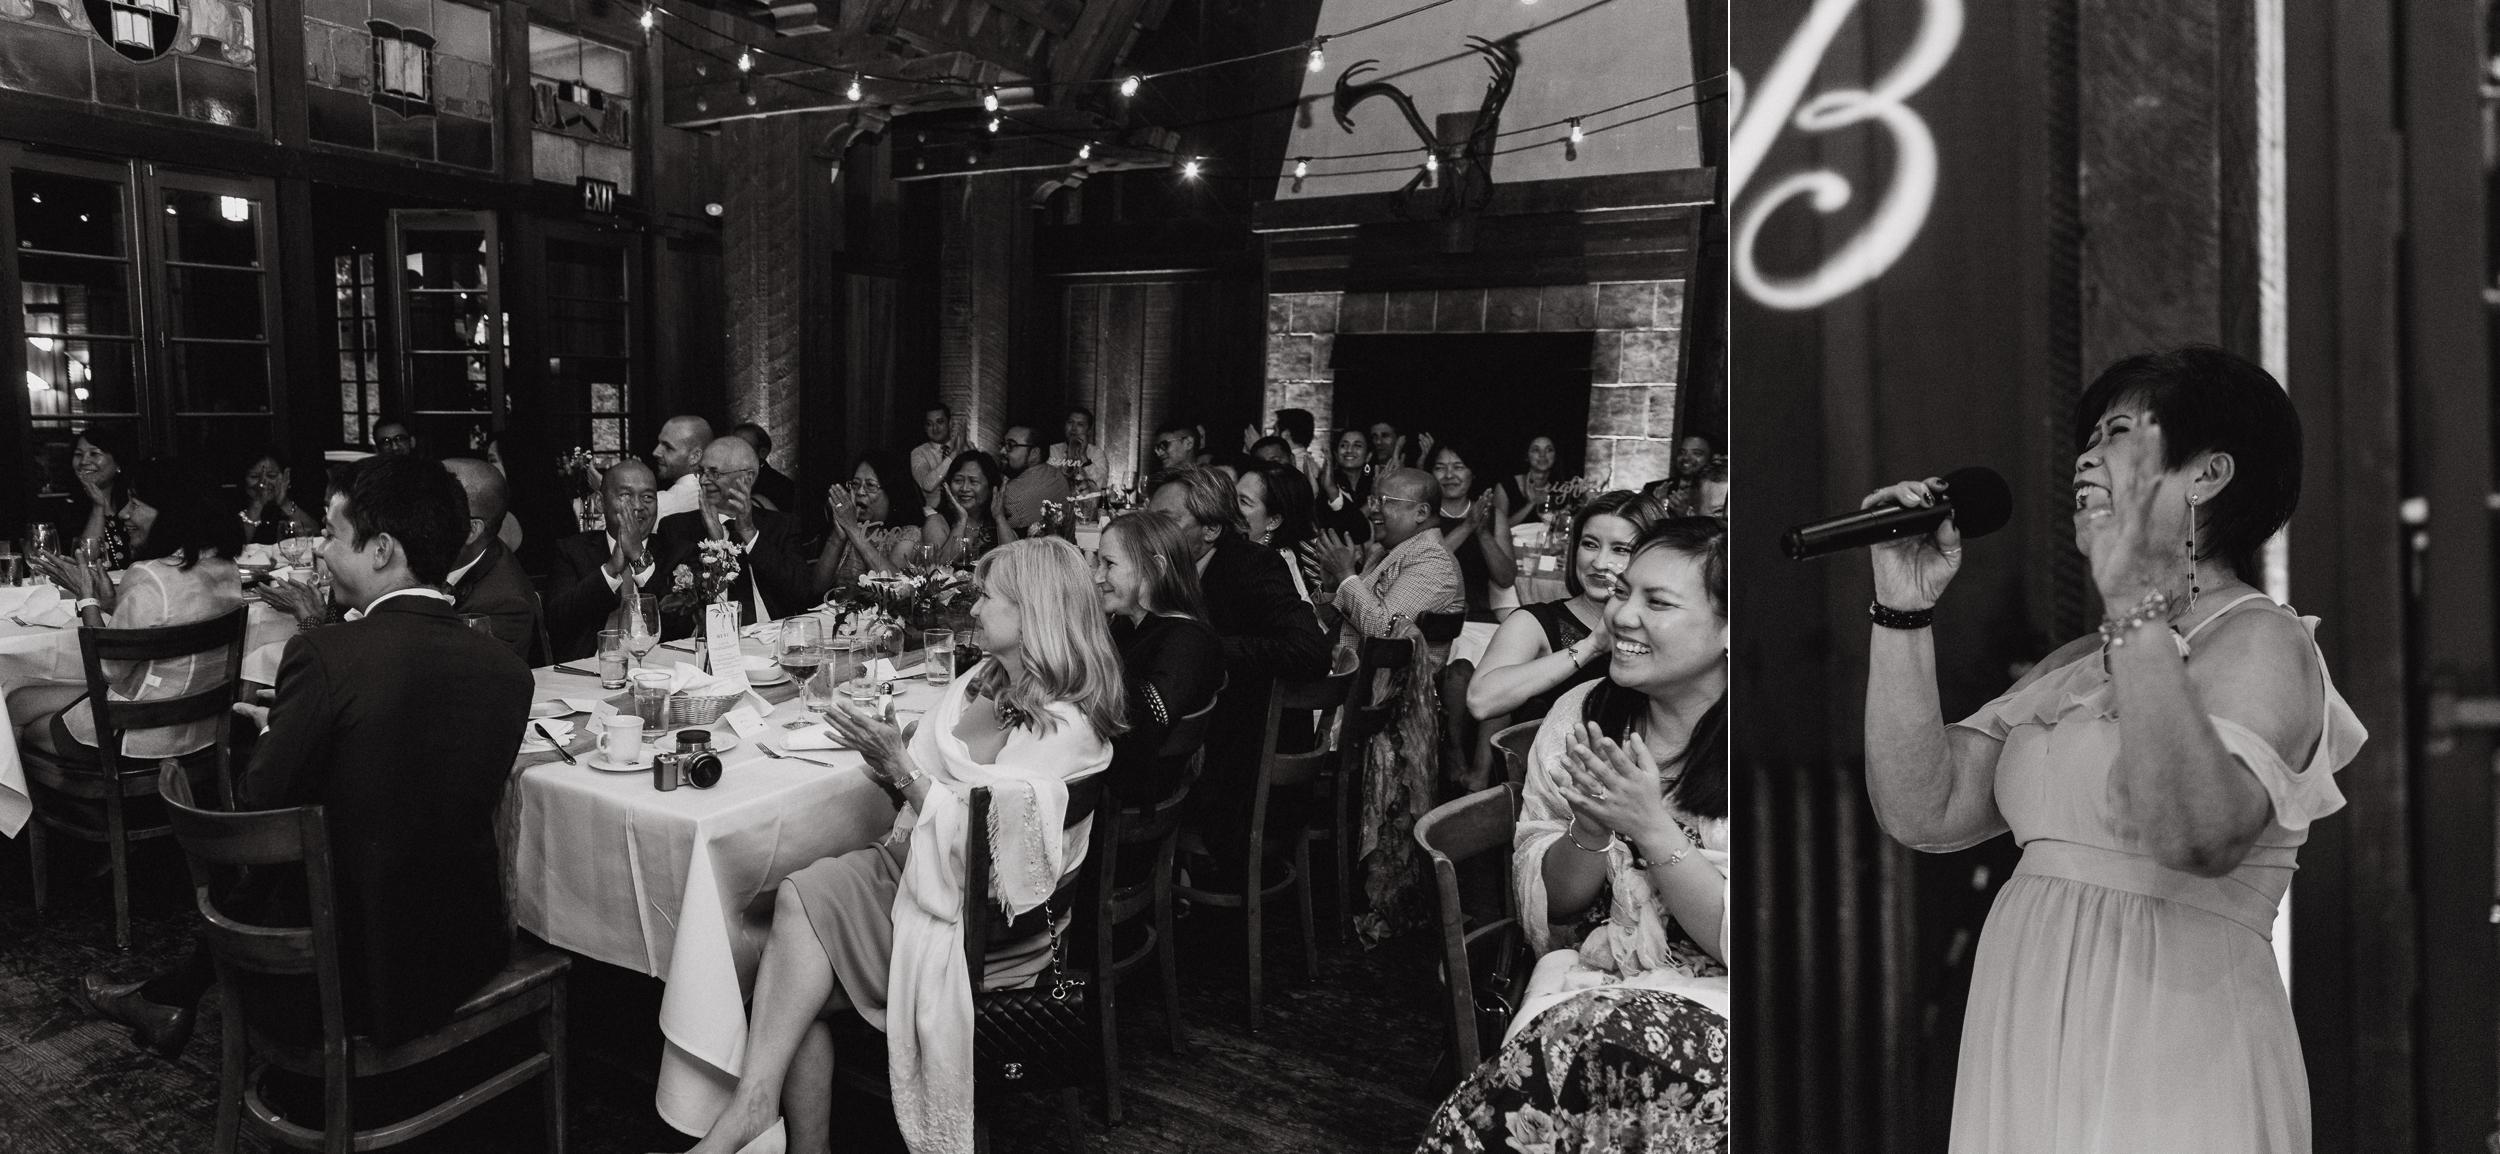 67-berkeley-uc-faculty-club-wedding-kb-vivianchen-428_WEB.jpg